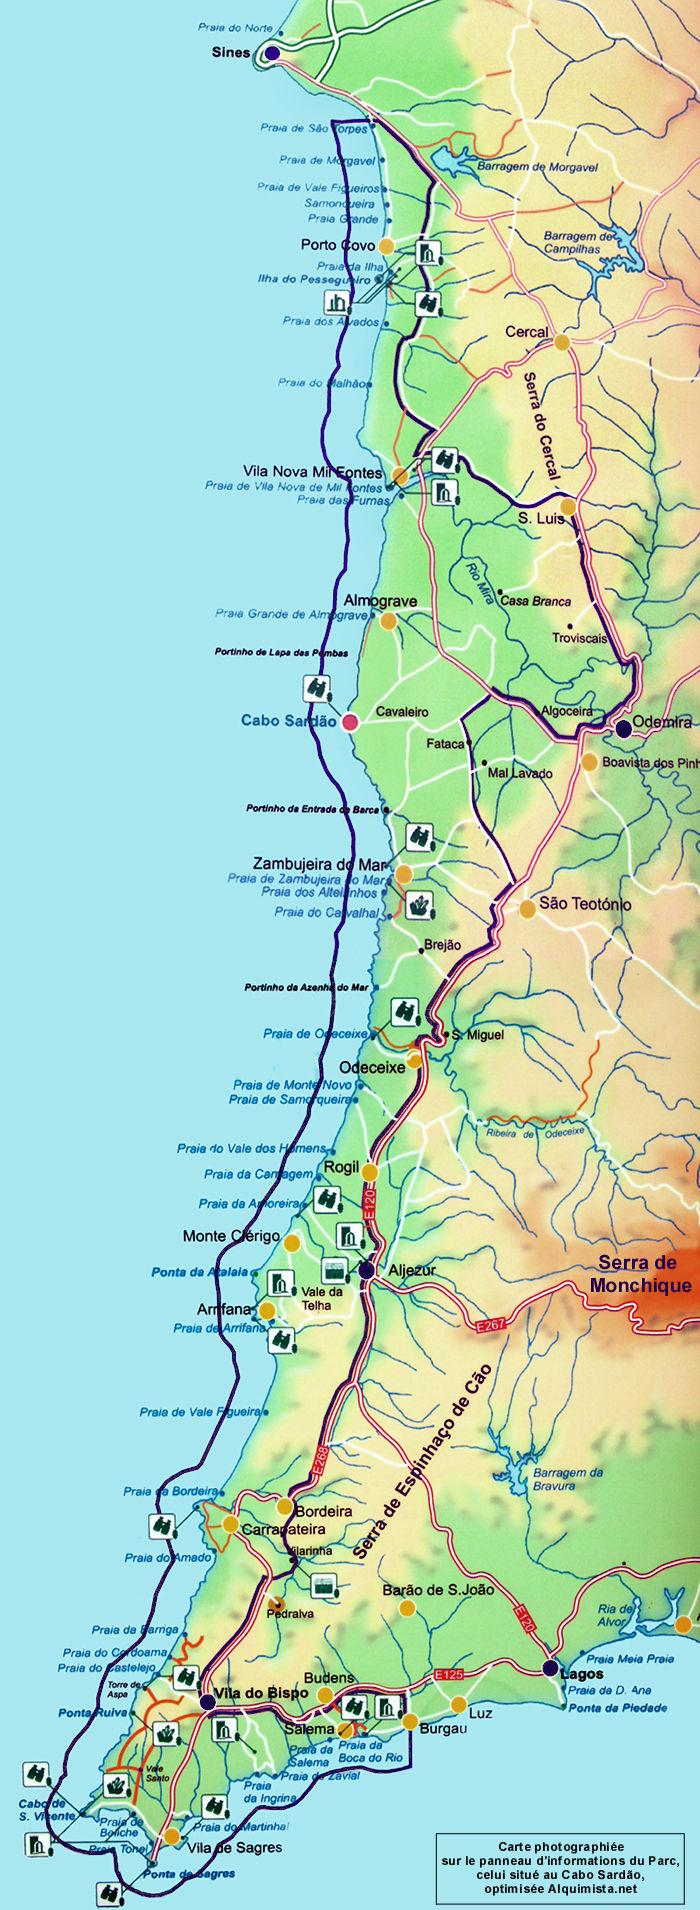 mapa costa alentejana algarve Petróleo e gás no Algarve e Costa Alentejana   Estudar, avaliar  mapa costa alentejana algarve